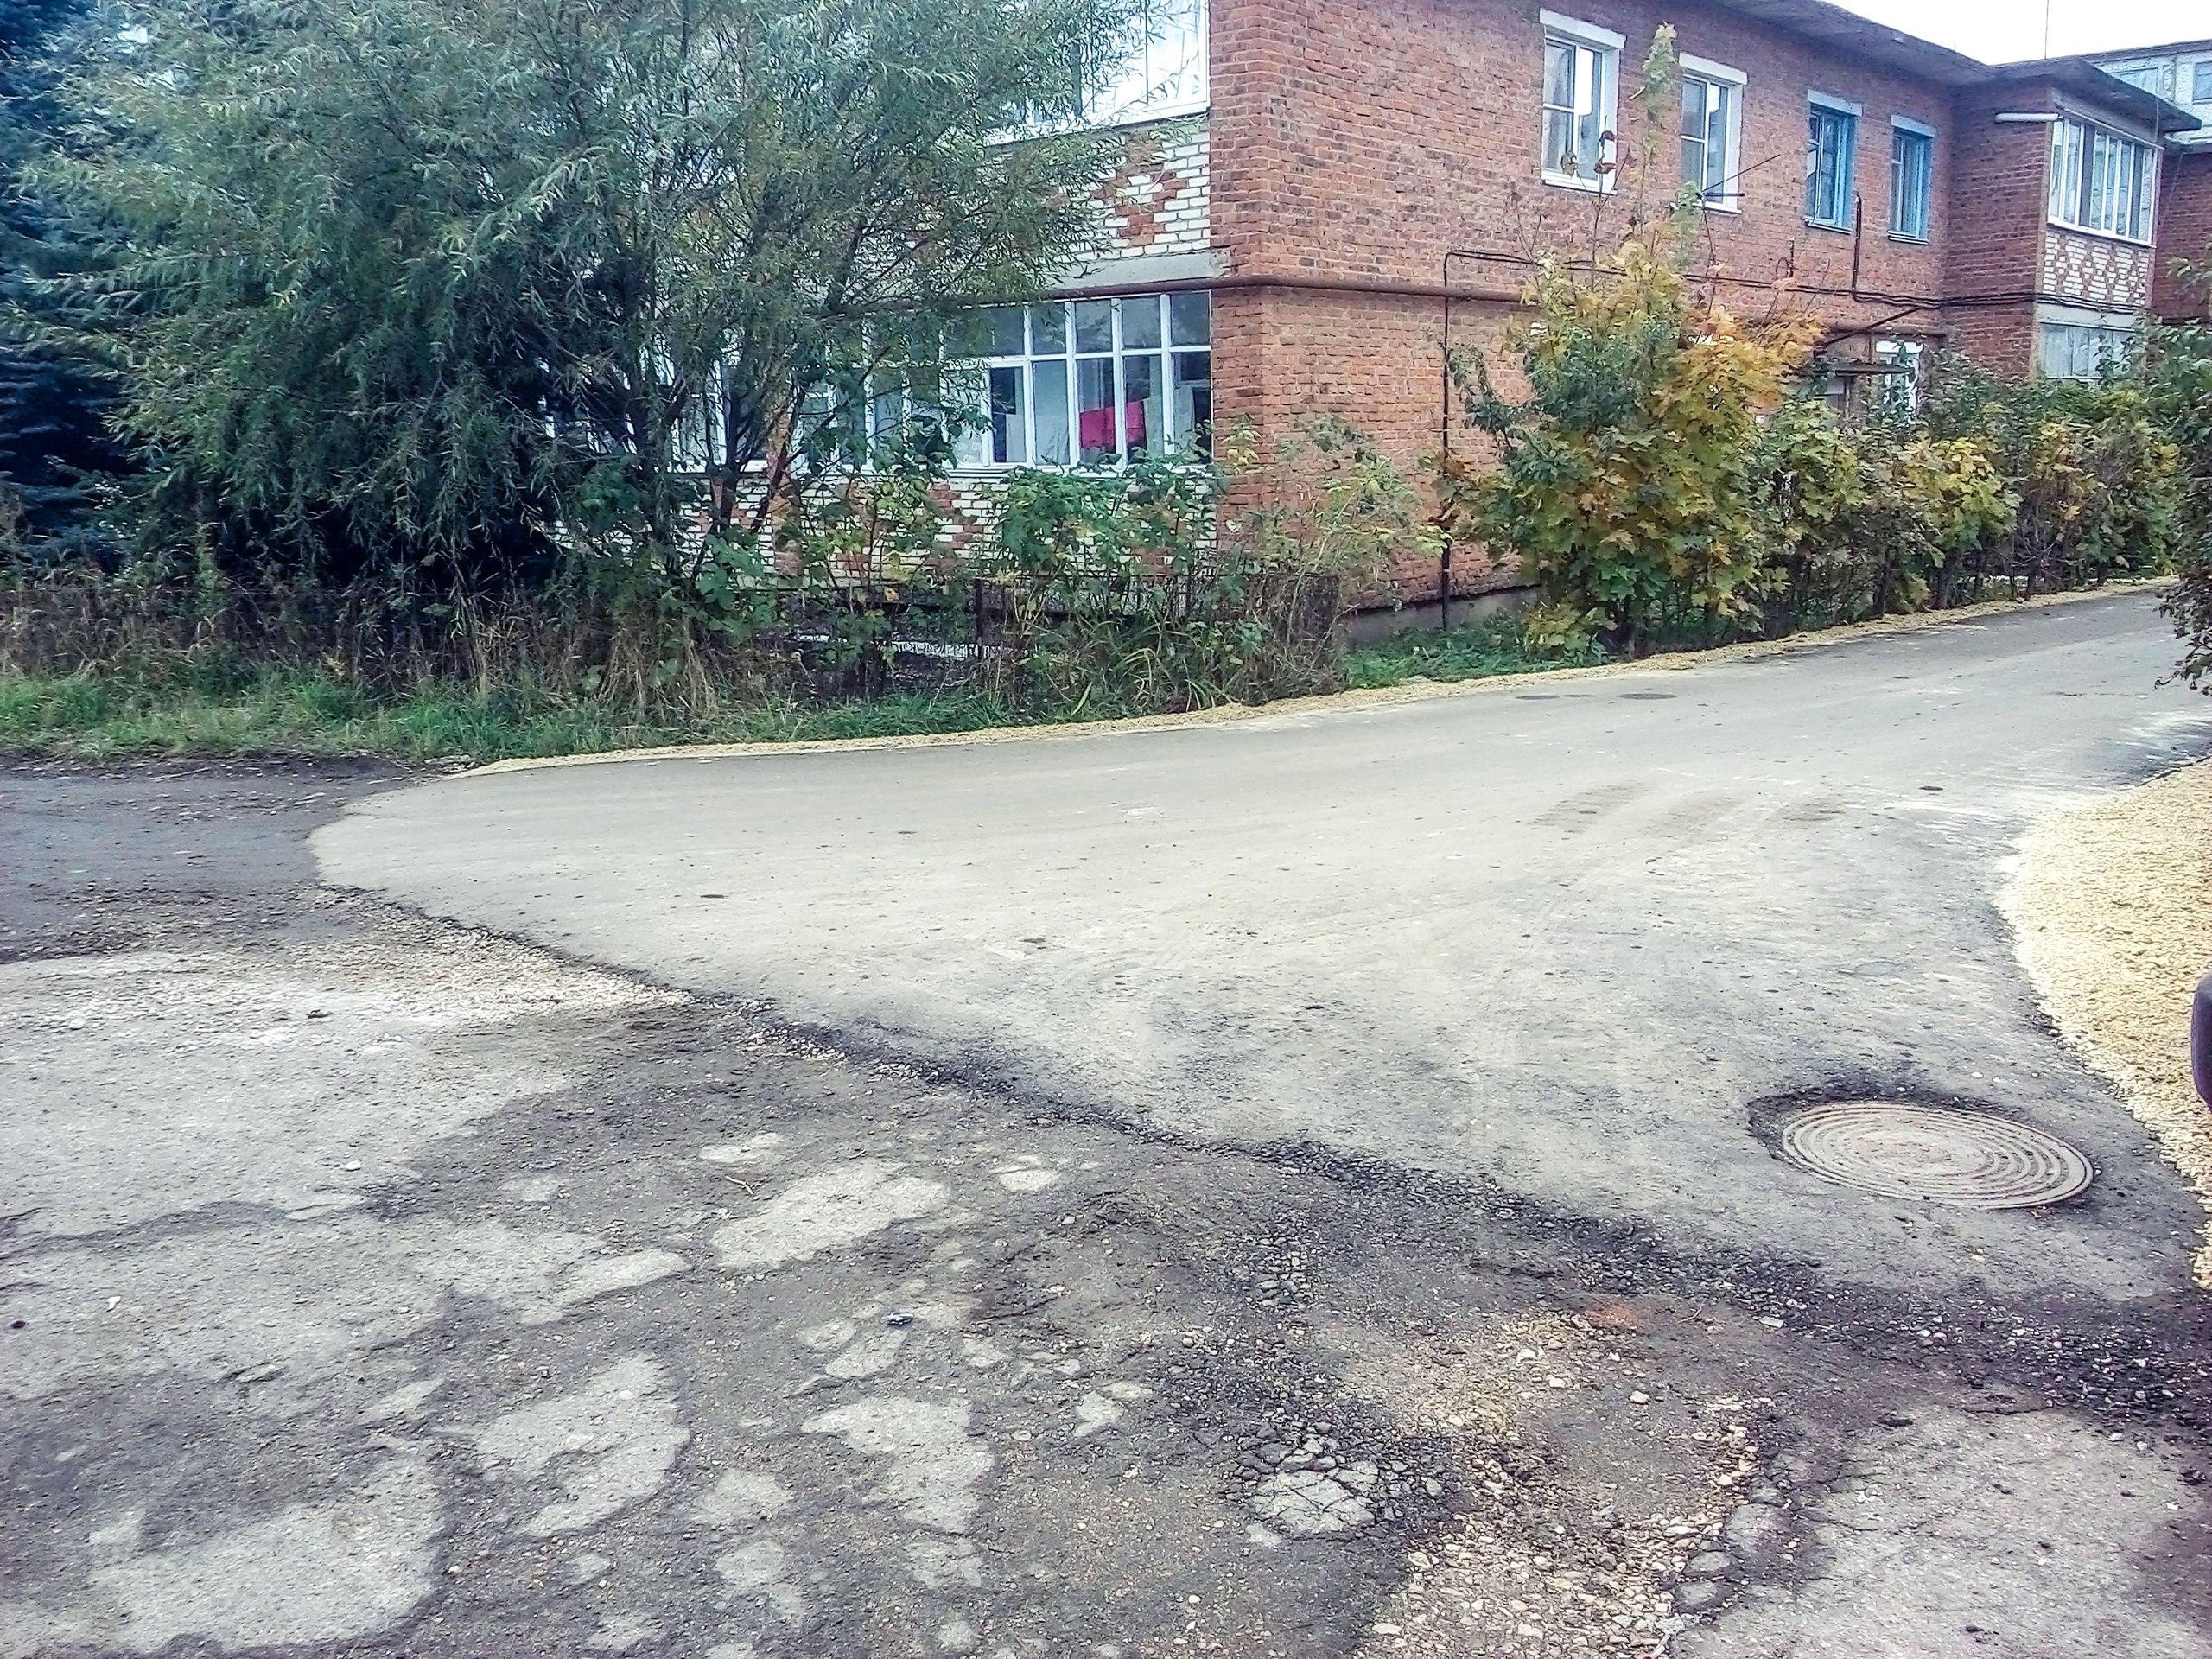 В квартале 5-я Пятилетка отремонтирована дорога